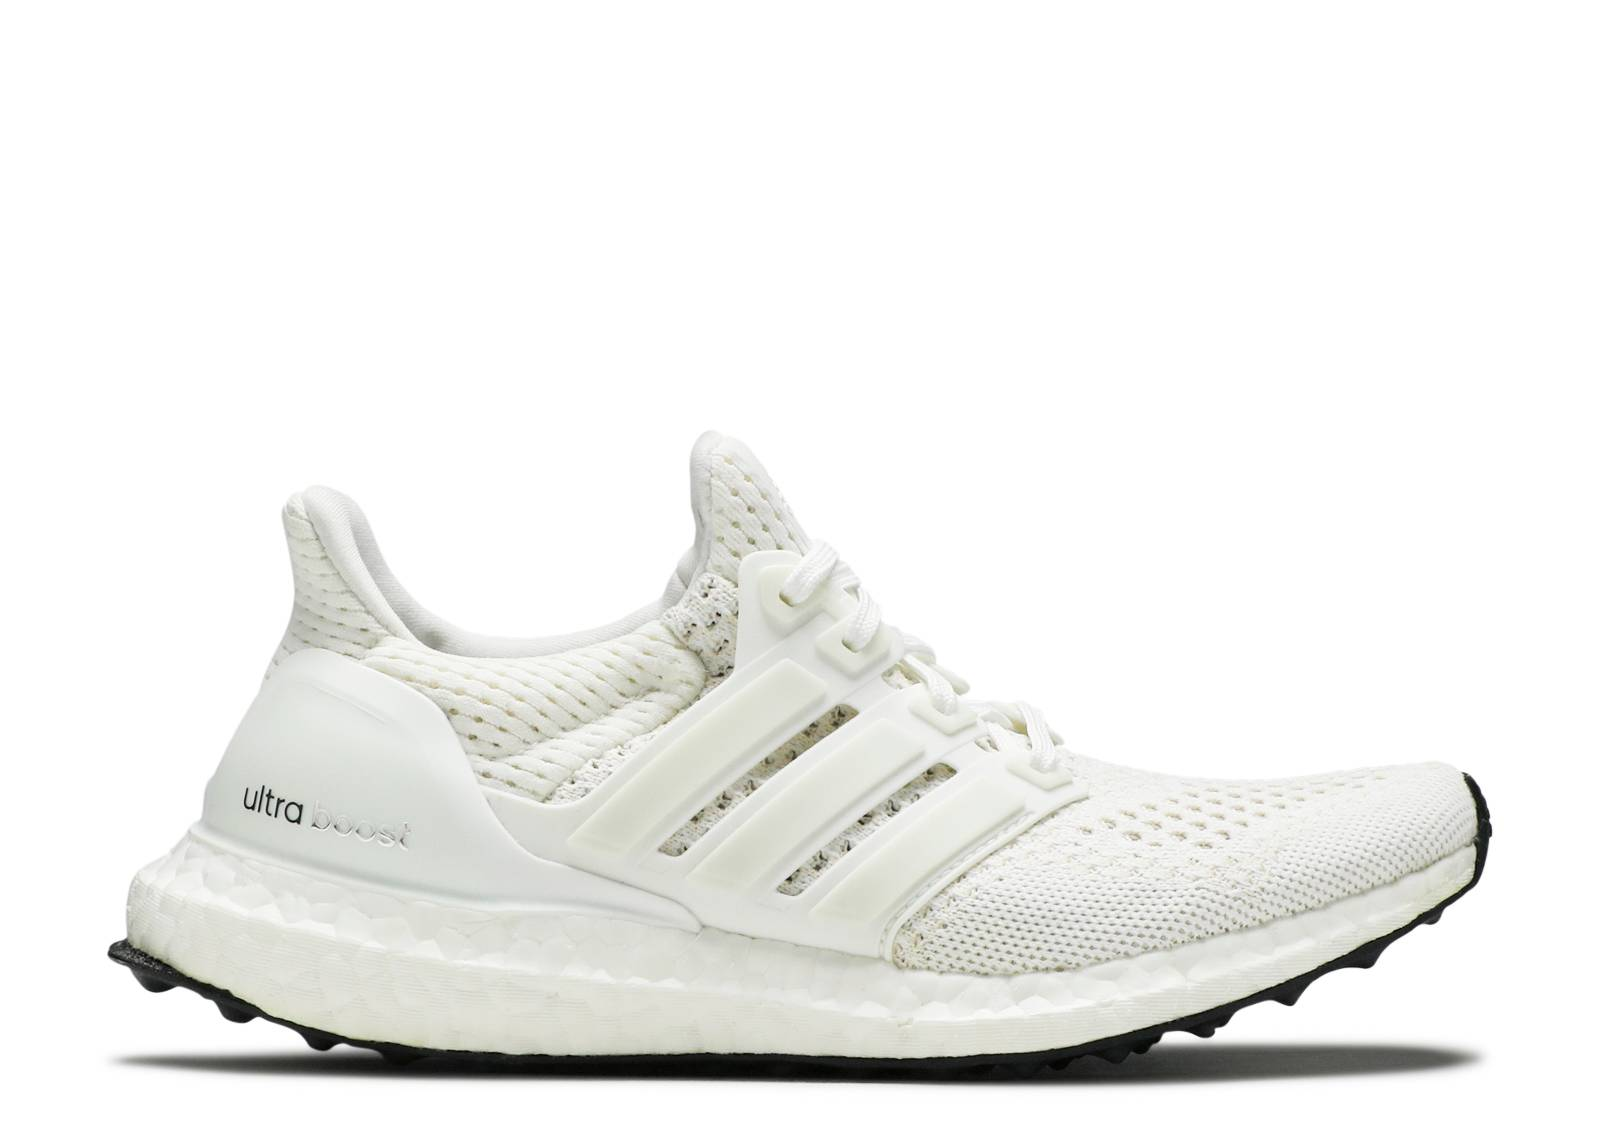 adidas ultra boost 1.0 white